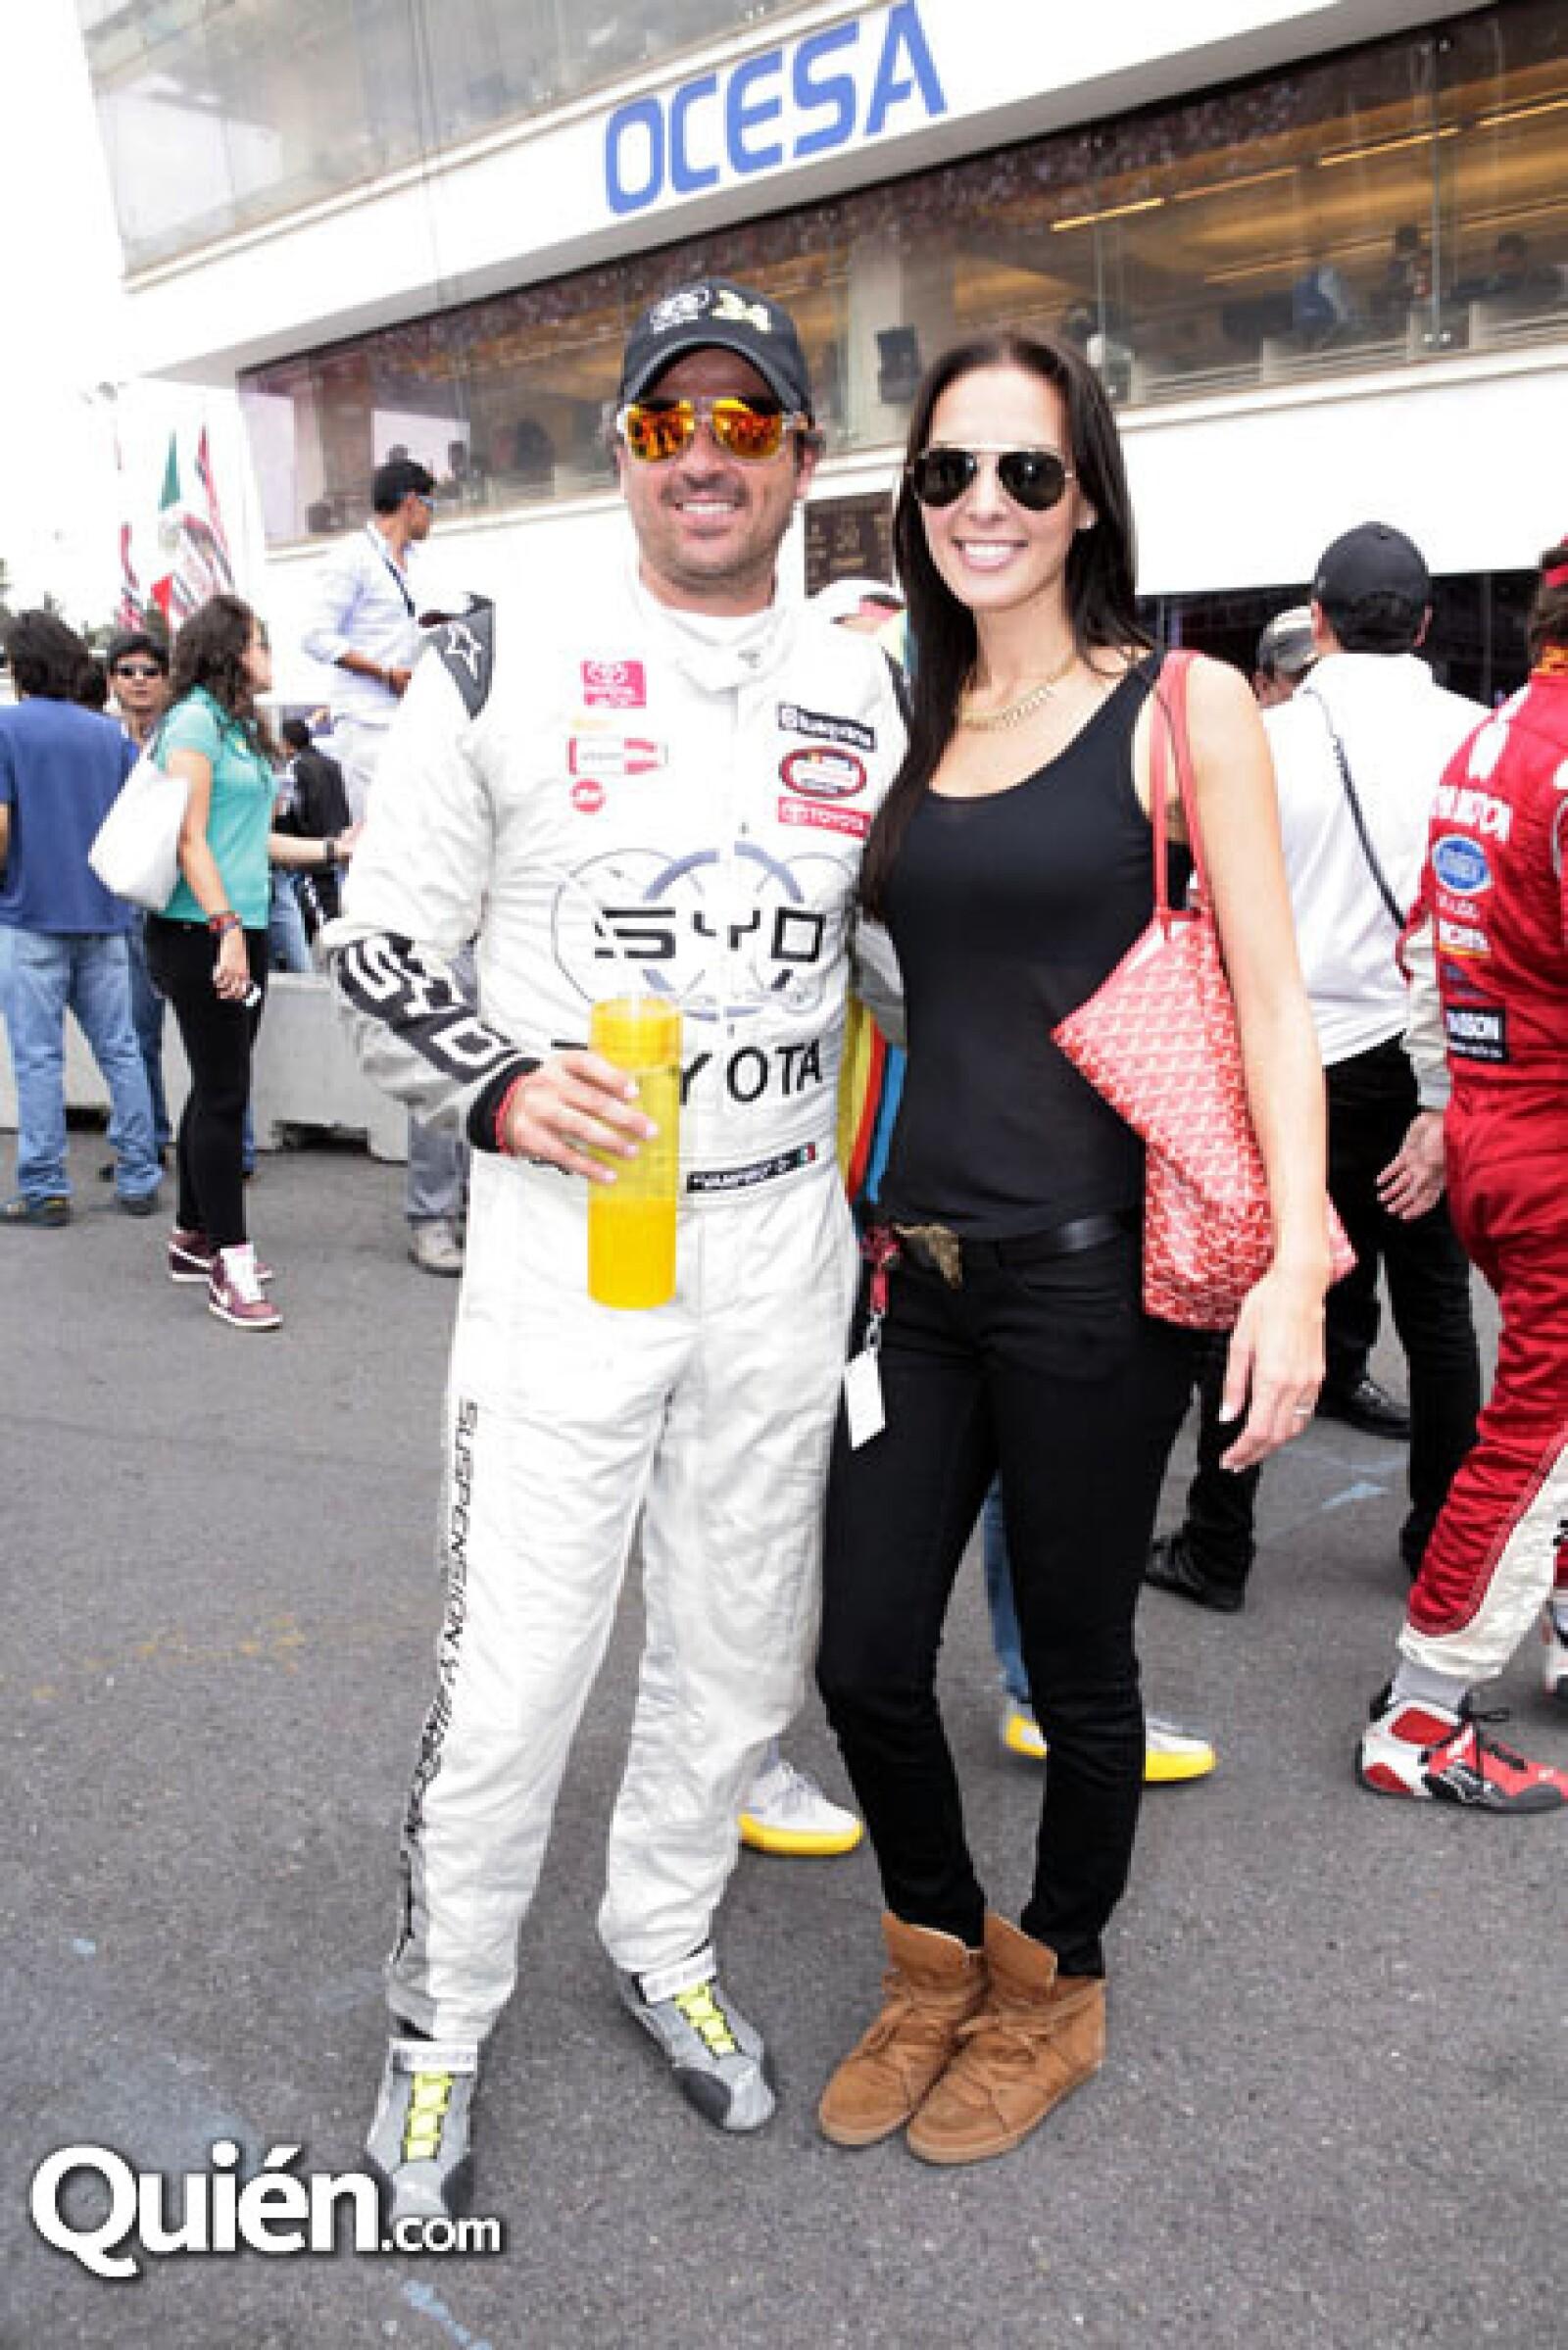 Óscar Ruiz,Alejandra Ruiz